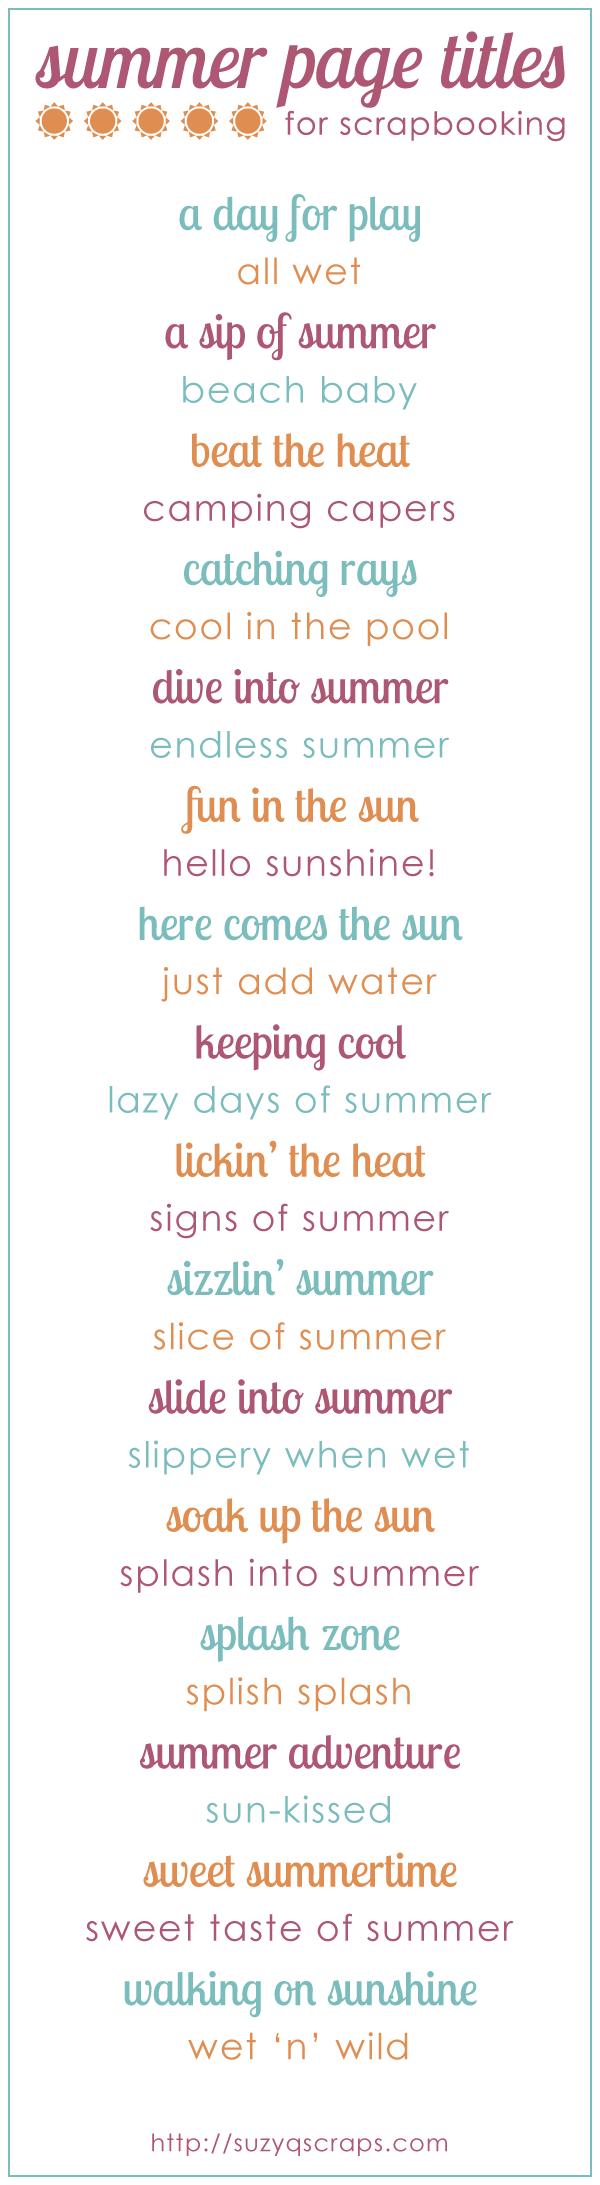 summer scrapbook idea   summer scrapbook page titles More